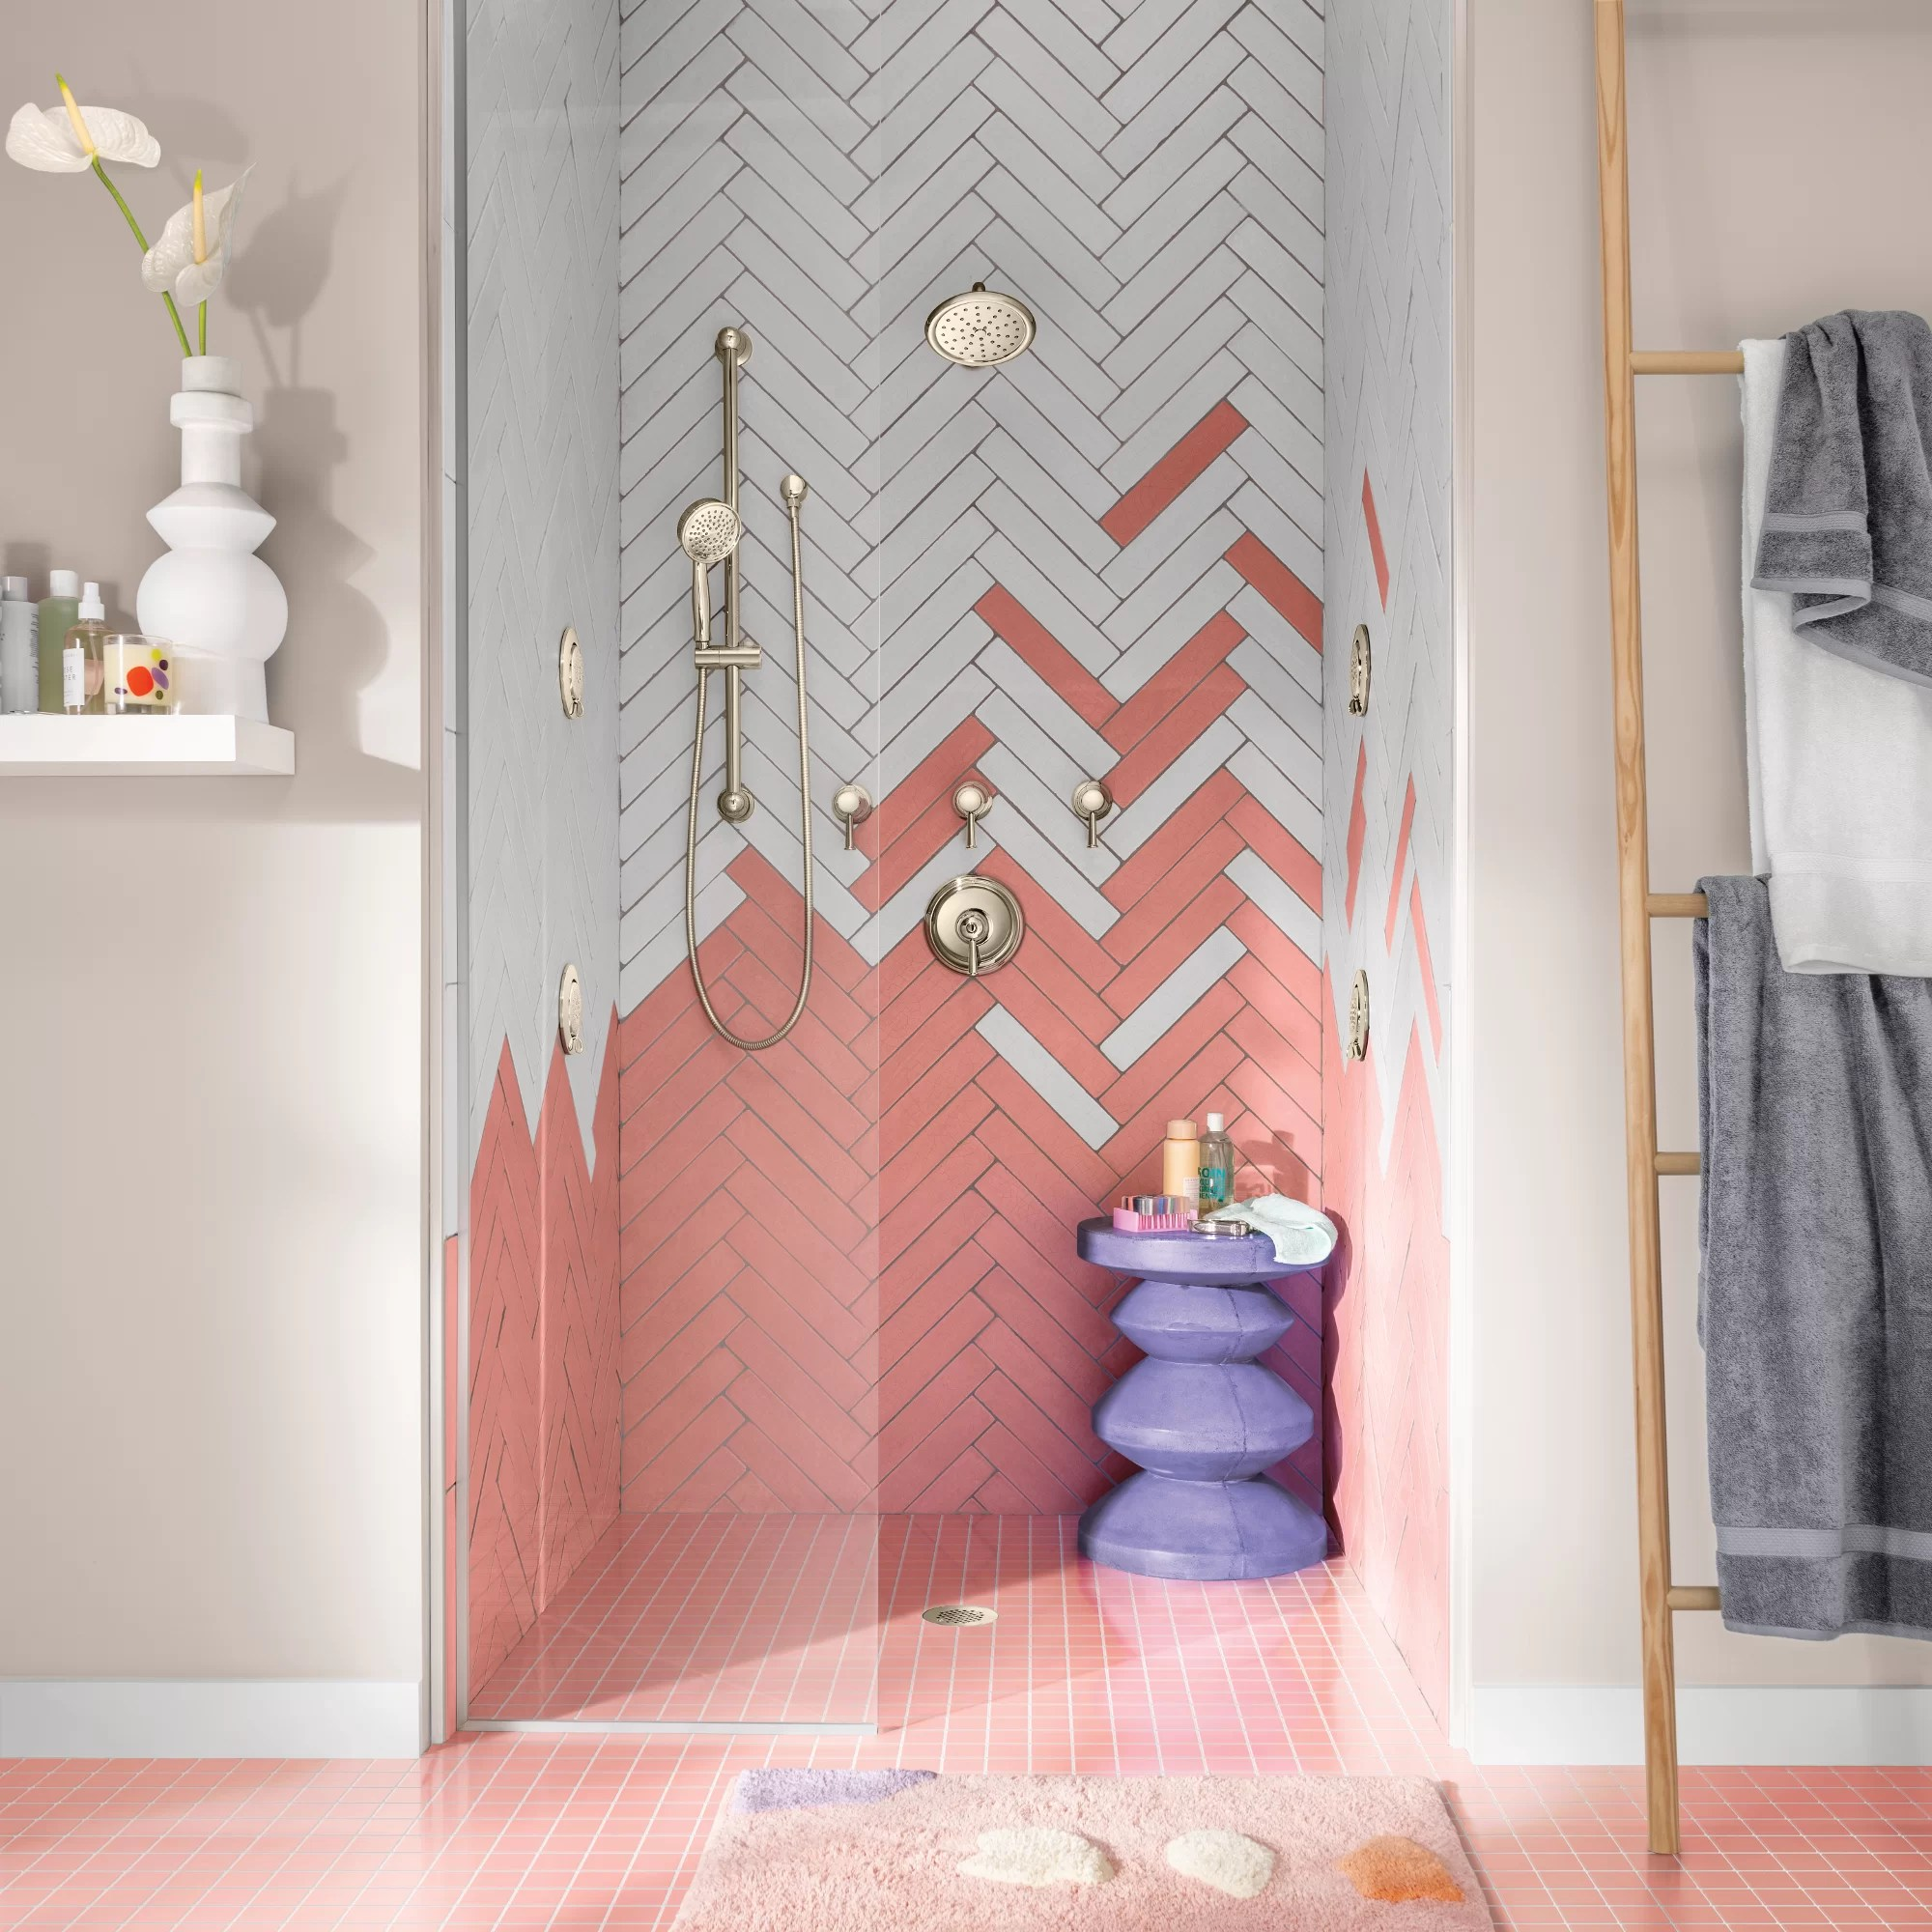 14 simply stunning bathroom shower